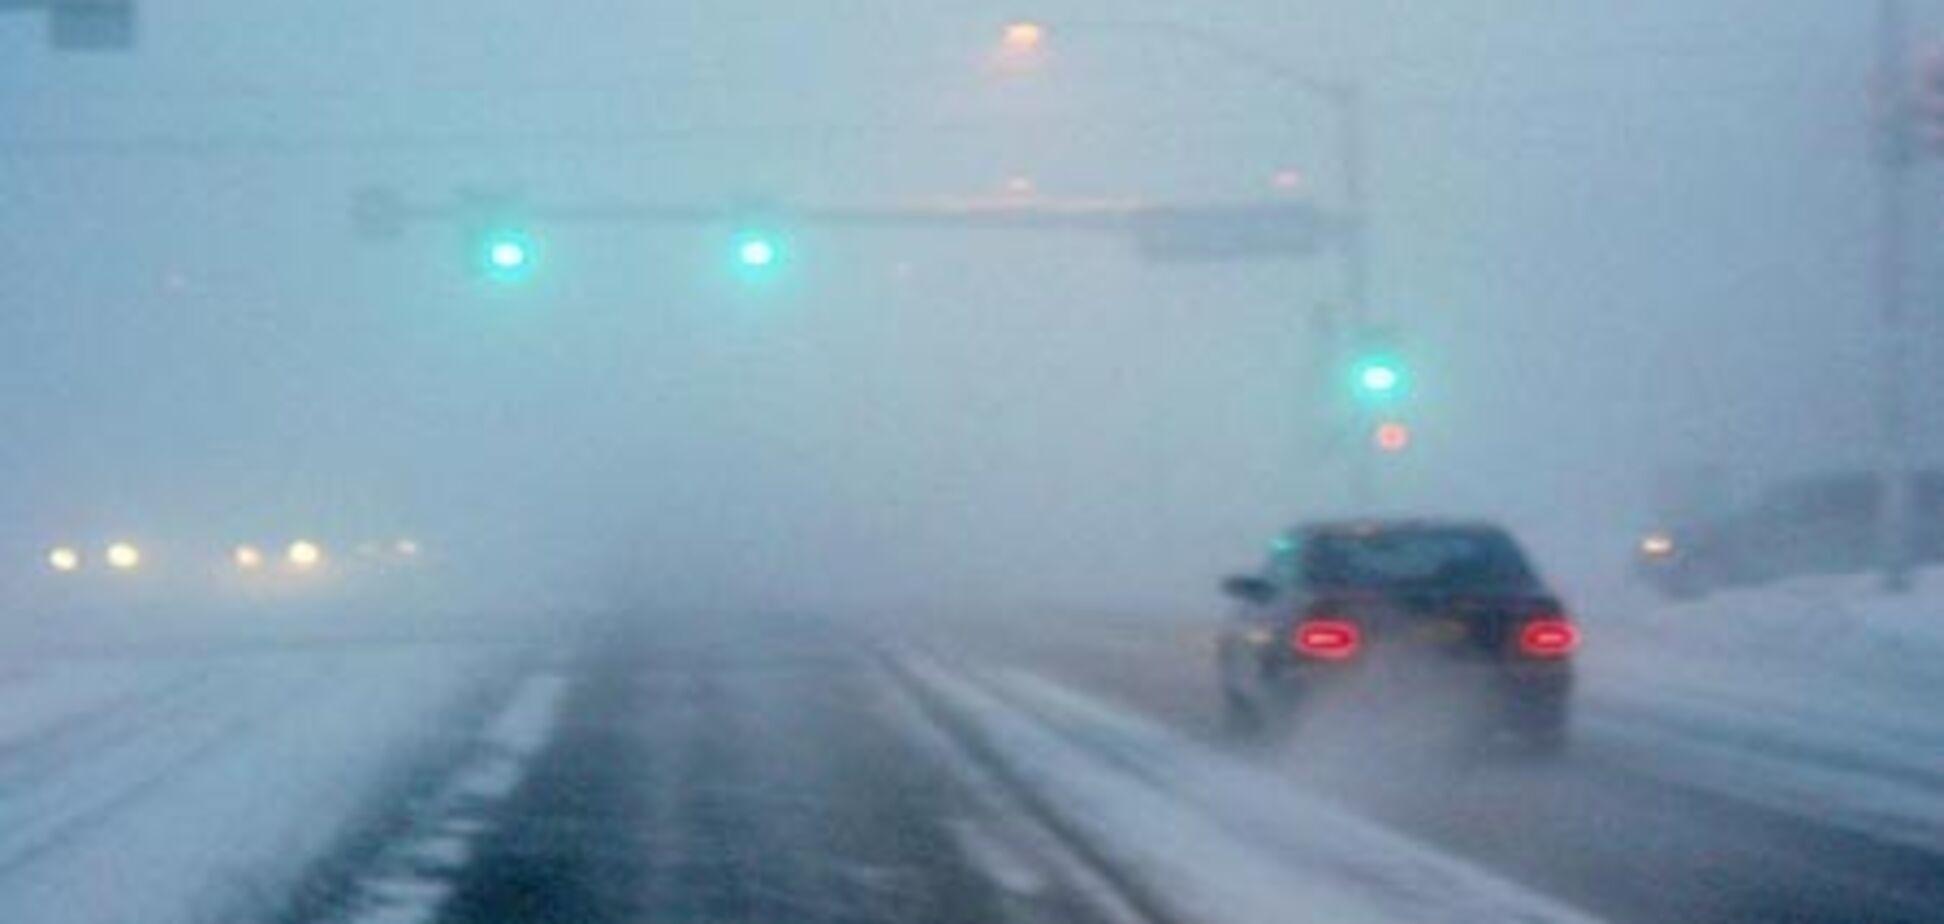 МЧС предупреждает: на дорогах туман и гололед